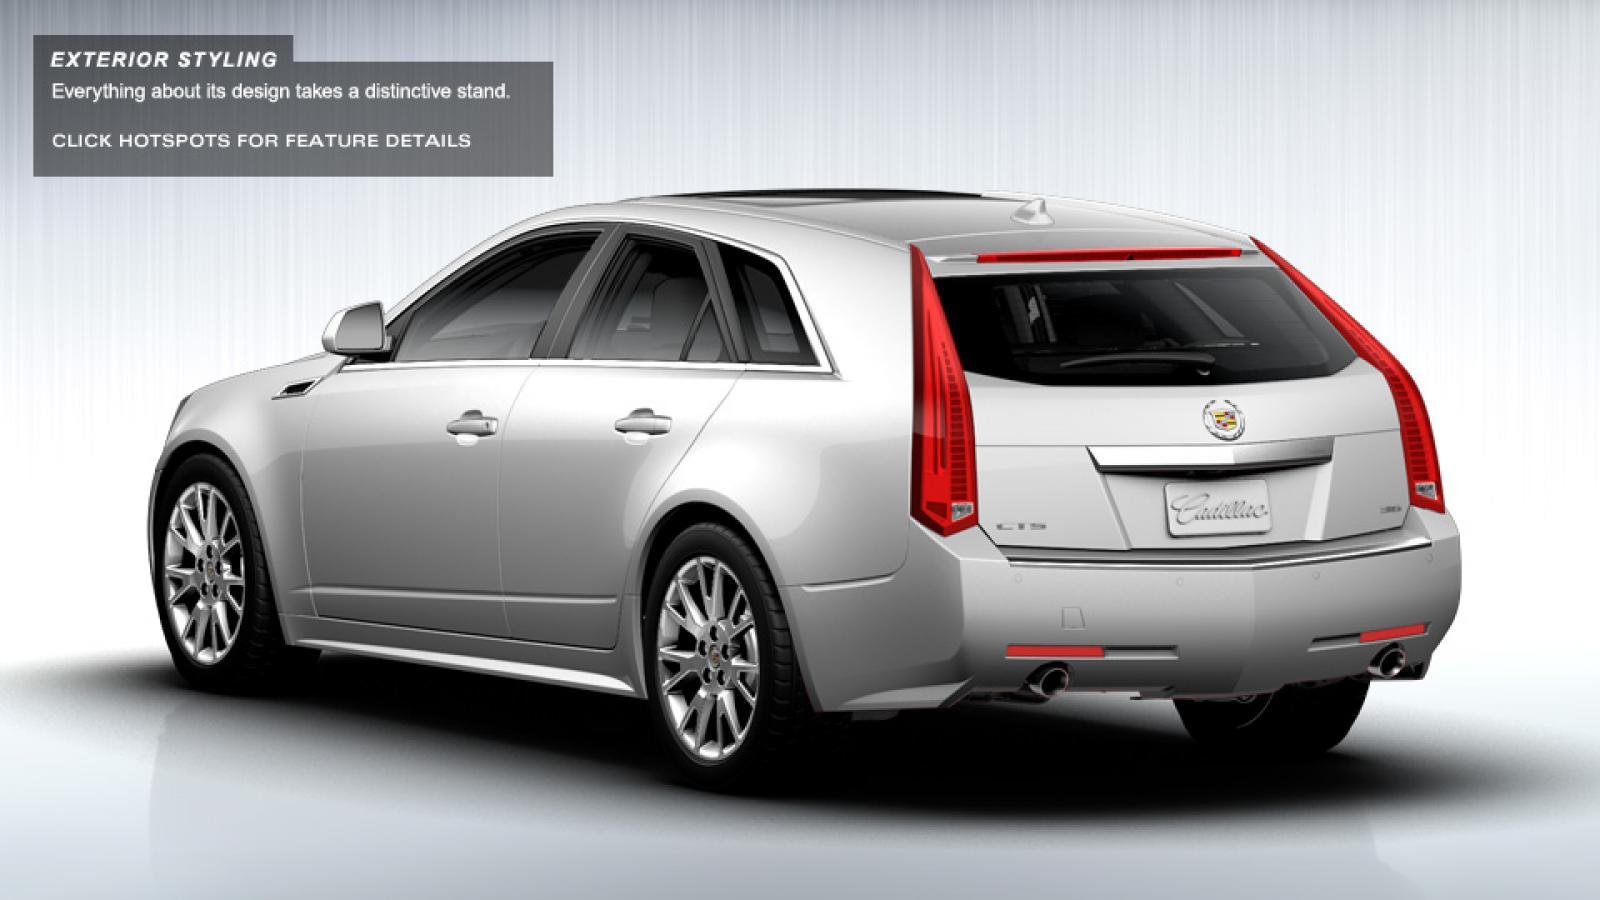 2014 Cadillac Cts Wagon Information And Photos Zombiedrive